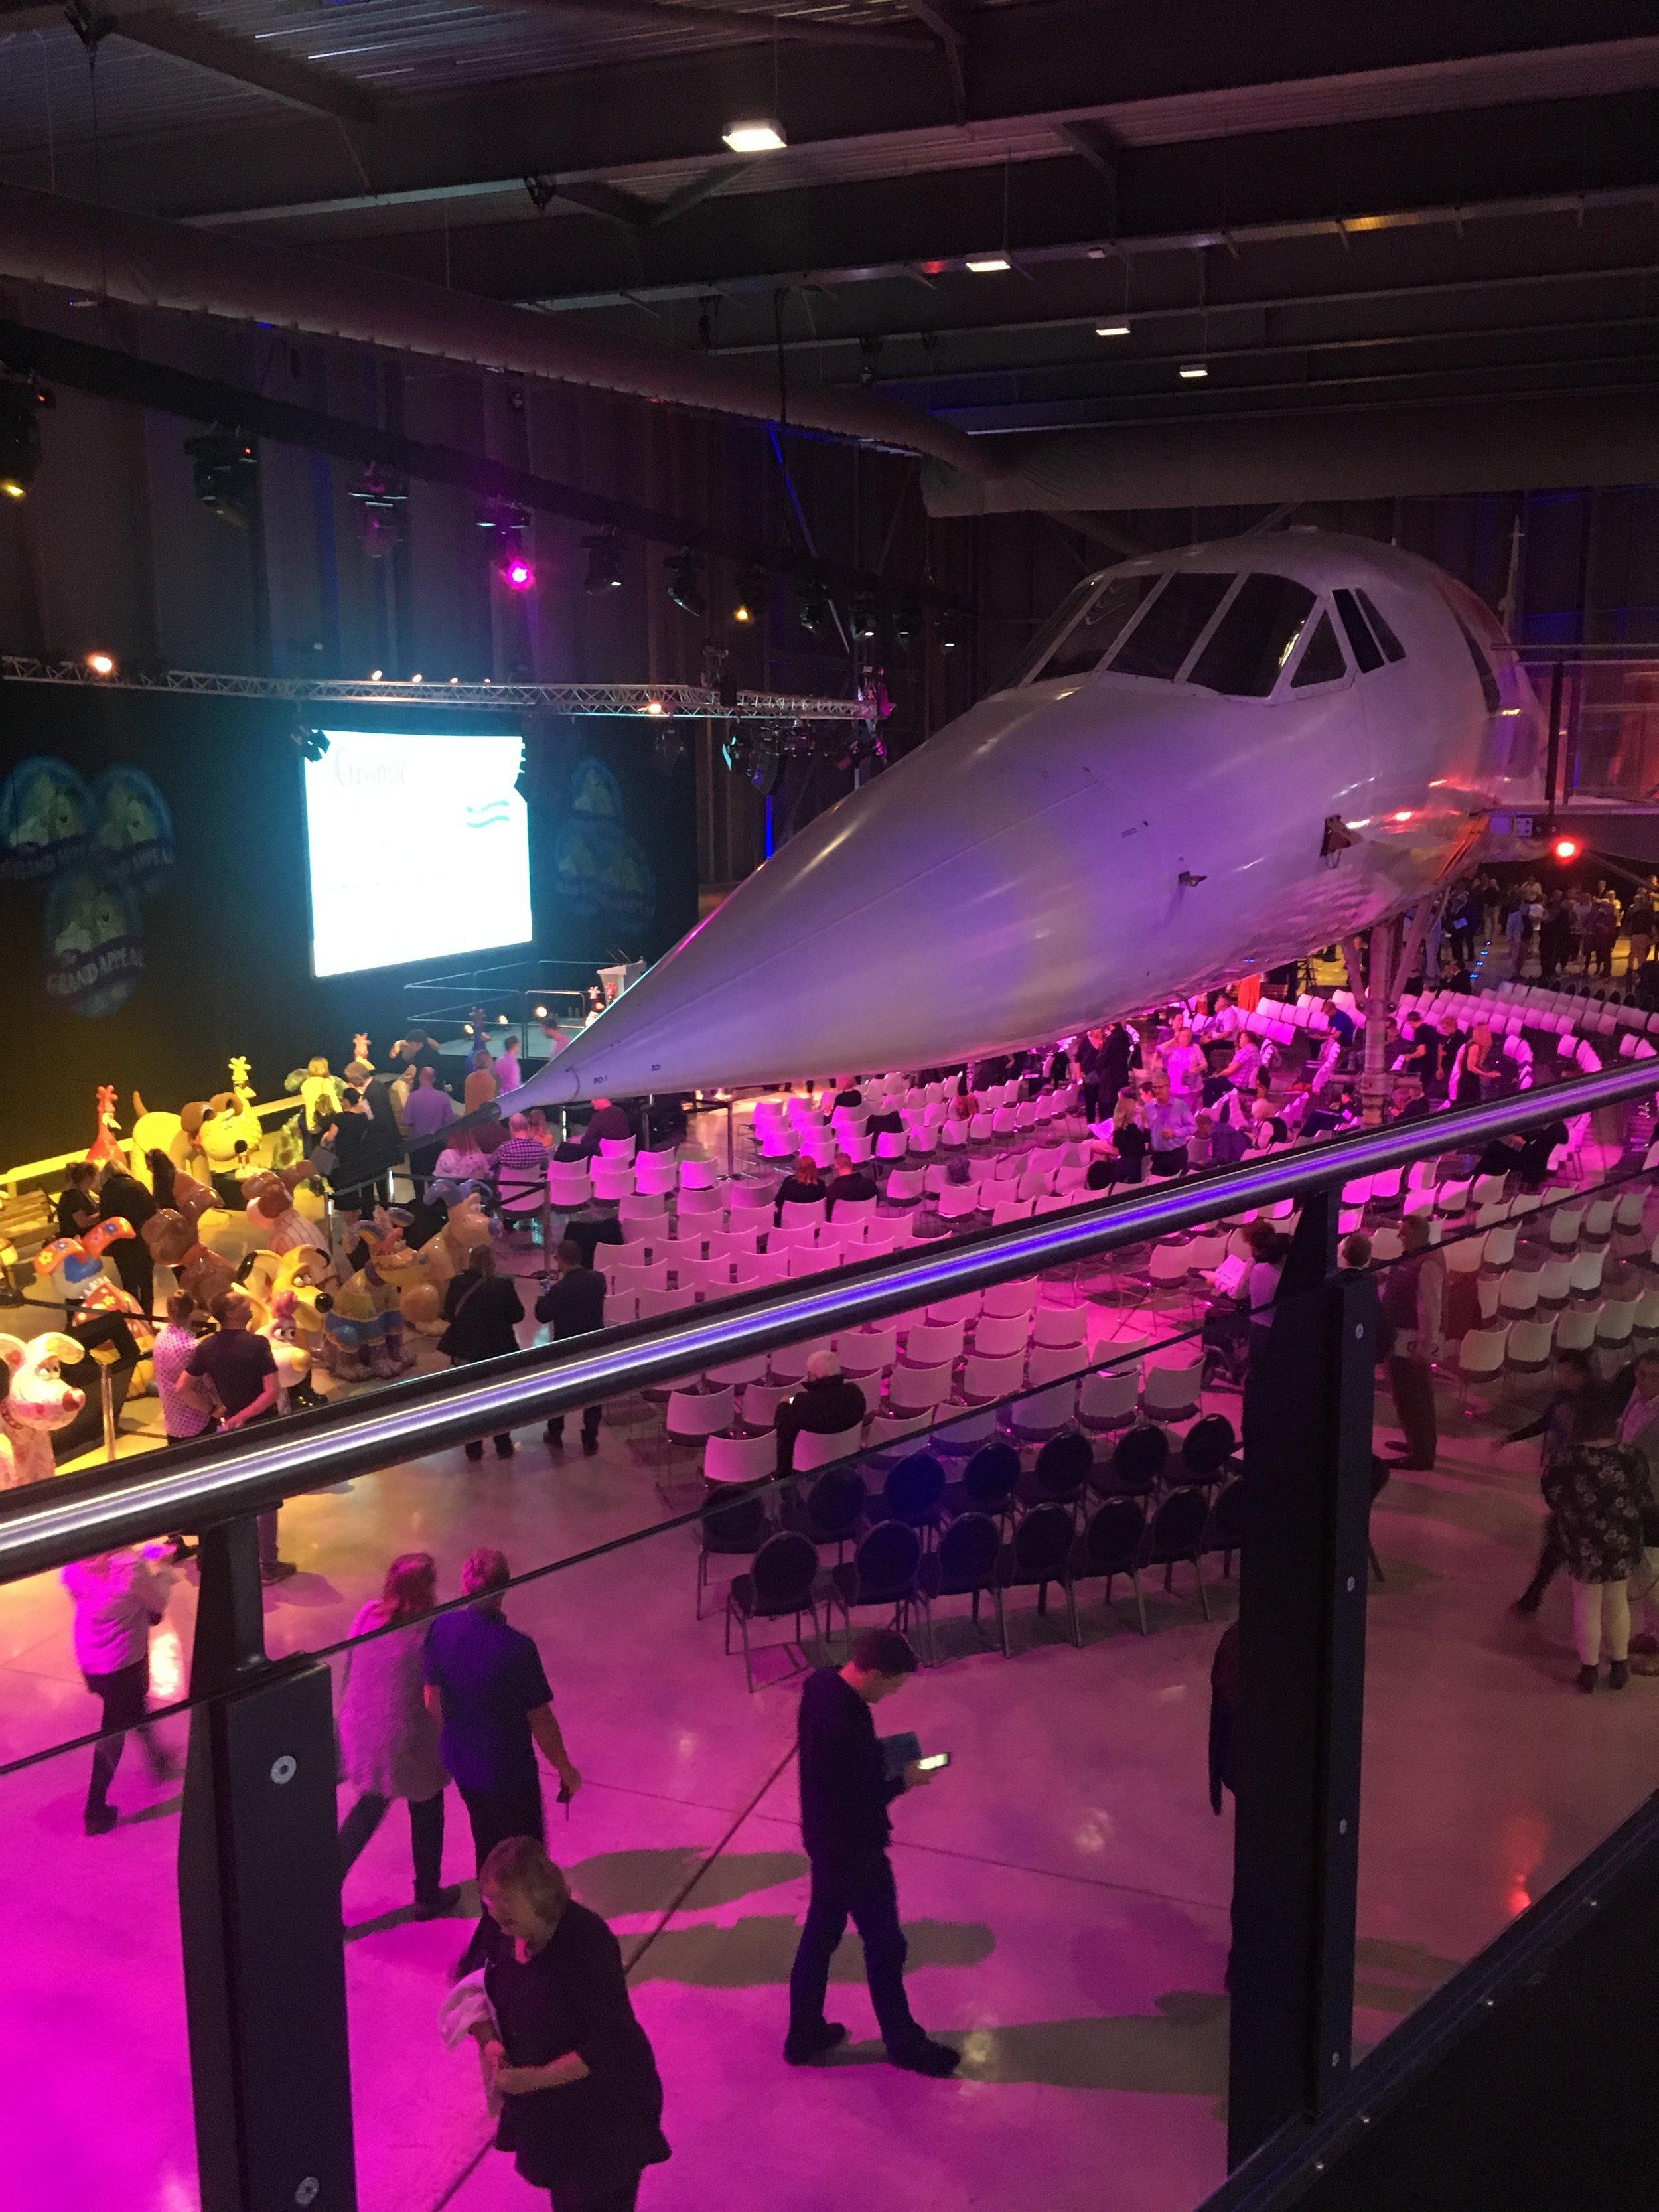 Aerospace Bristol - Concorde Museum